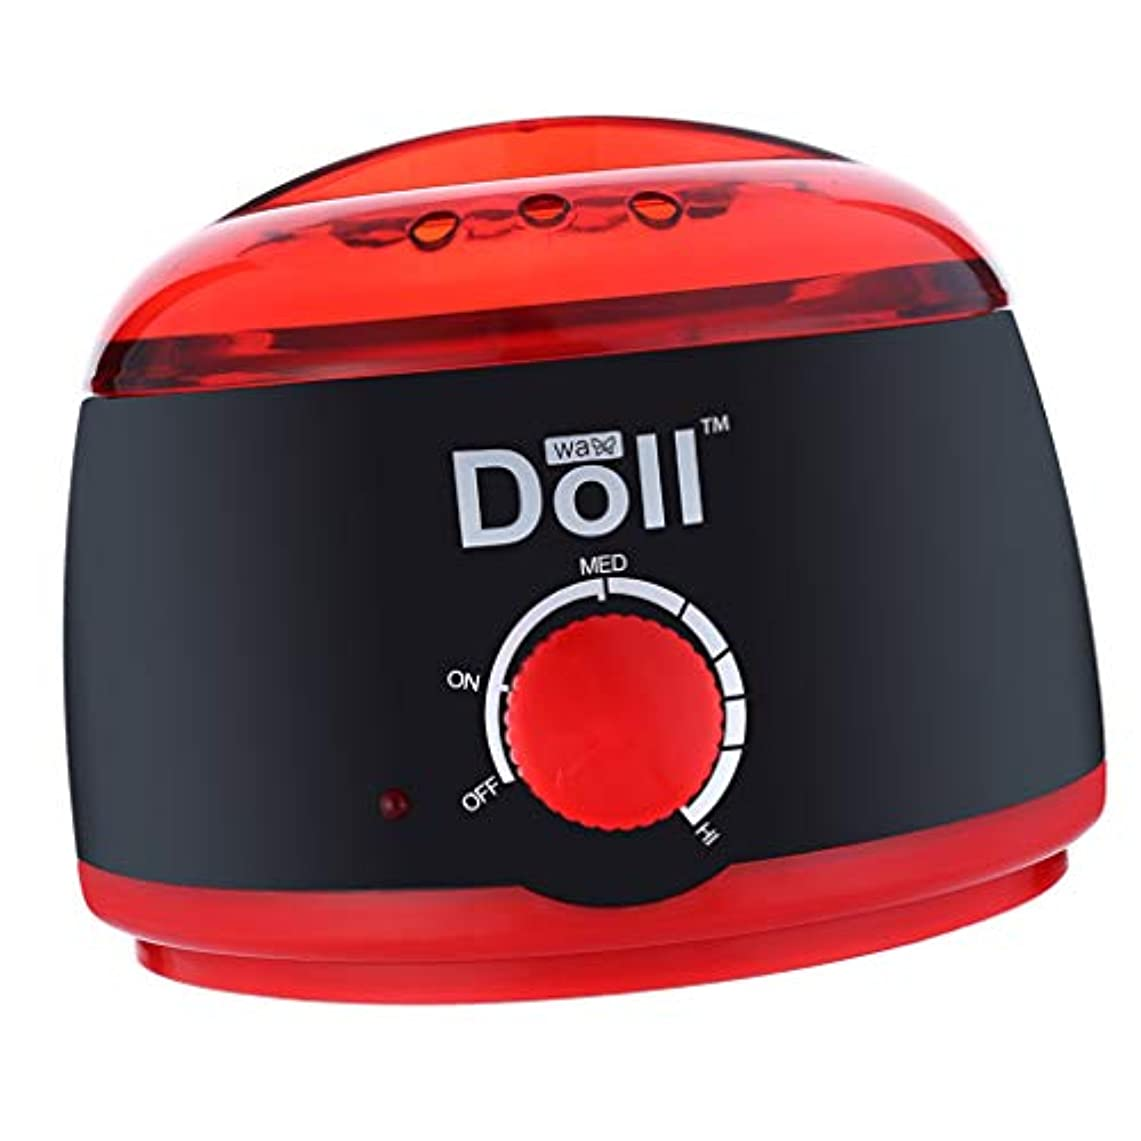 dailymall 電気脱毛機ハードホットワックス暖房ヒーター溶融鍋私たちのプラグ